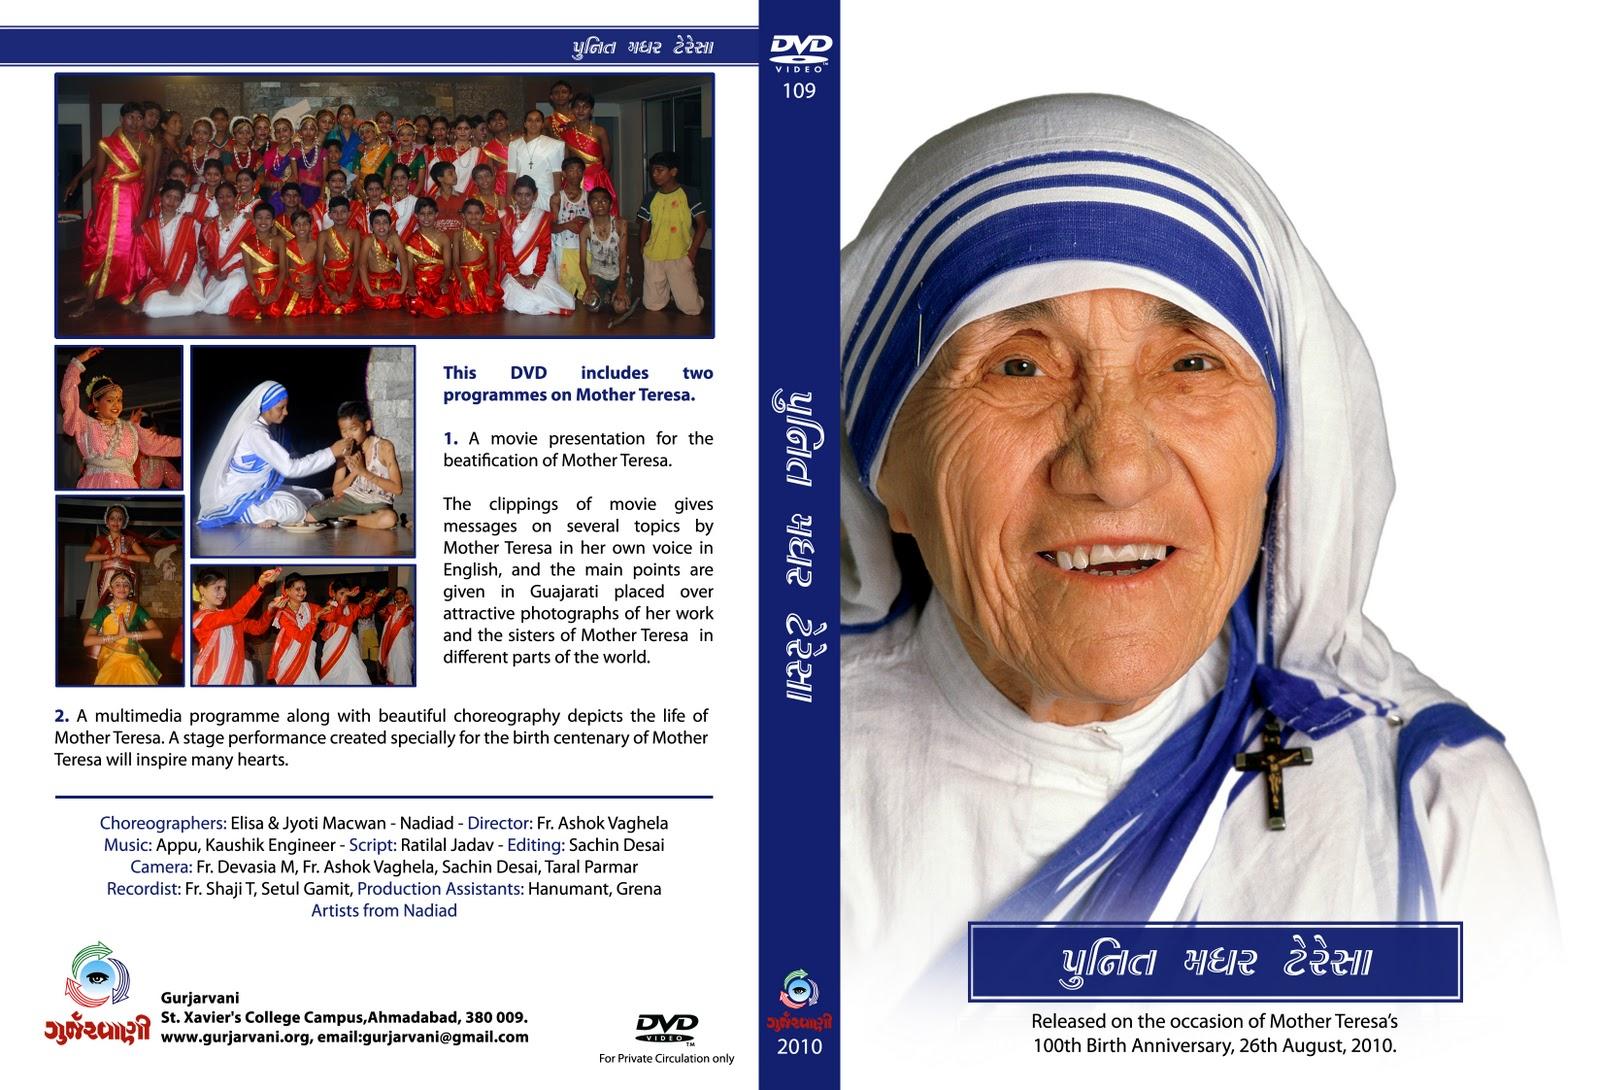 A DVD on Mother Teresa